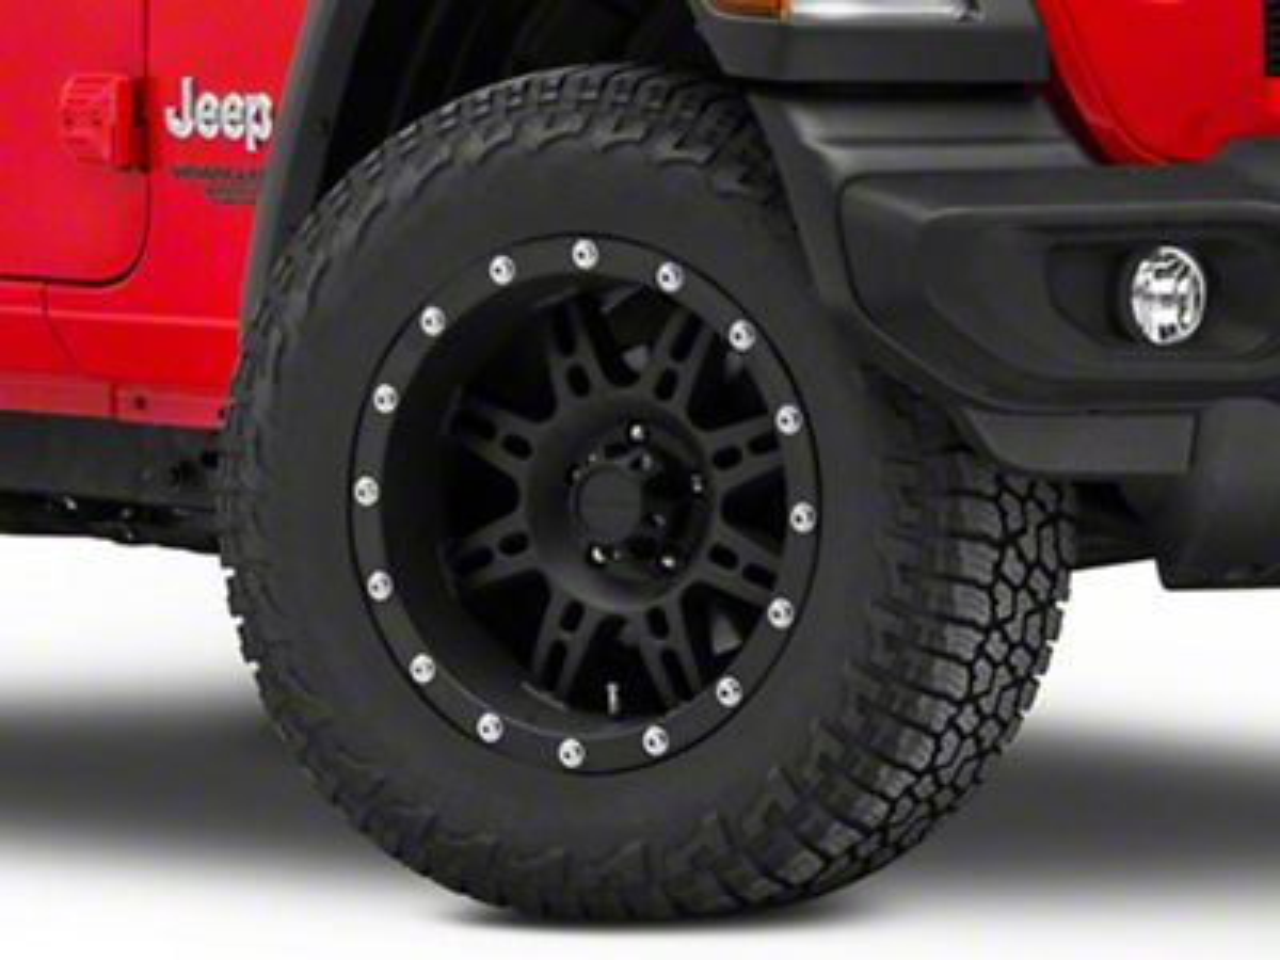 Pro Comp Wheels Alloy Series 7031 Flat Black Wheel - 18x9 (18-19 Jeep Wrangler JL)